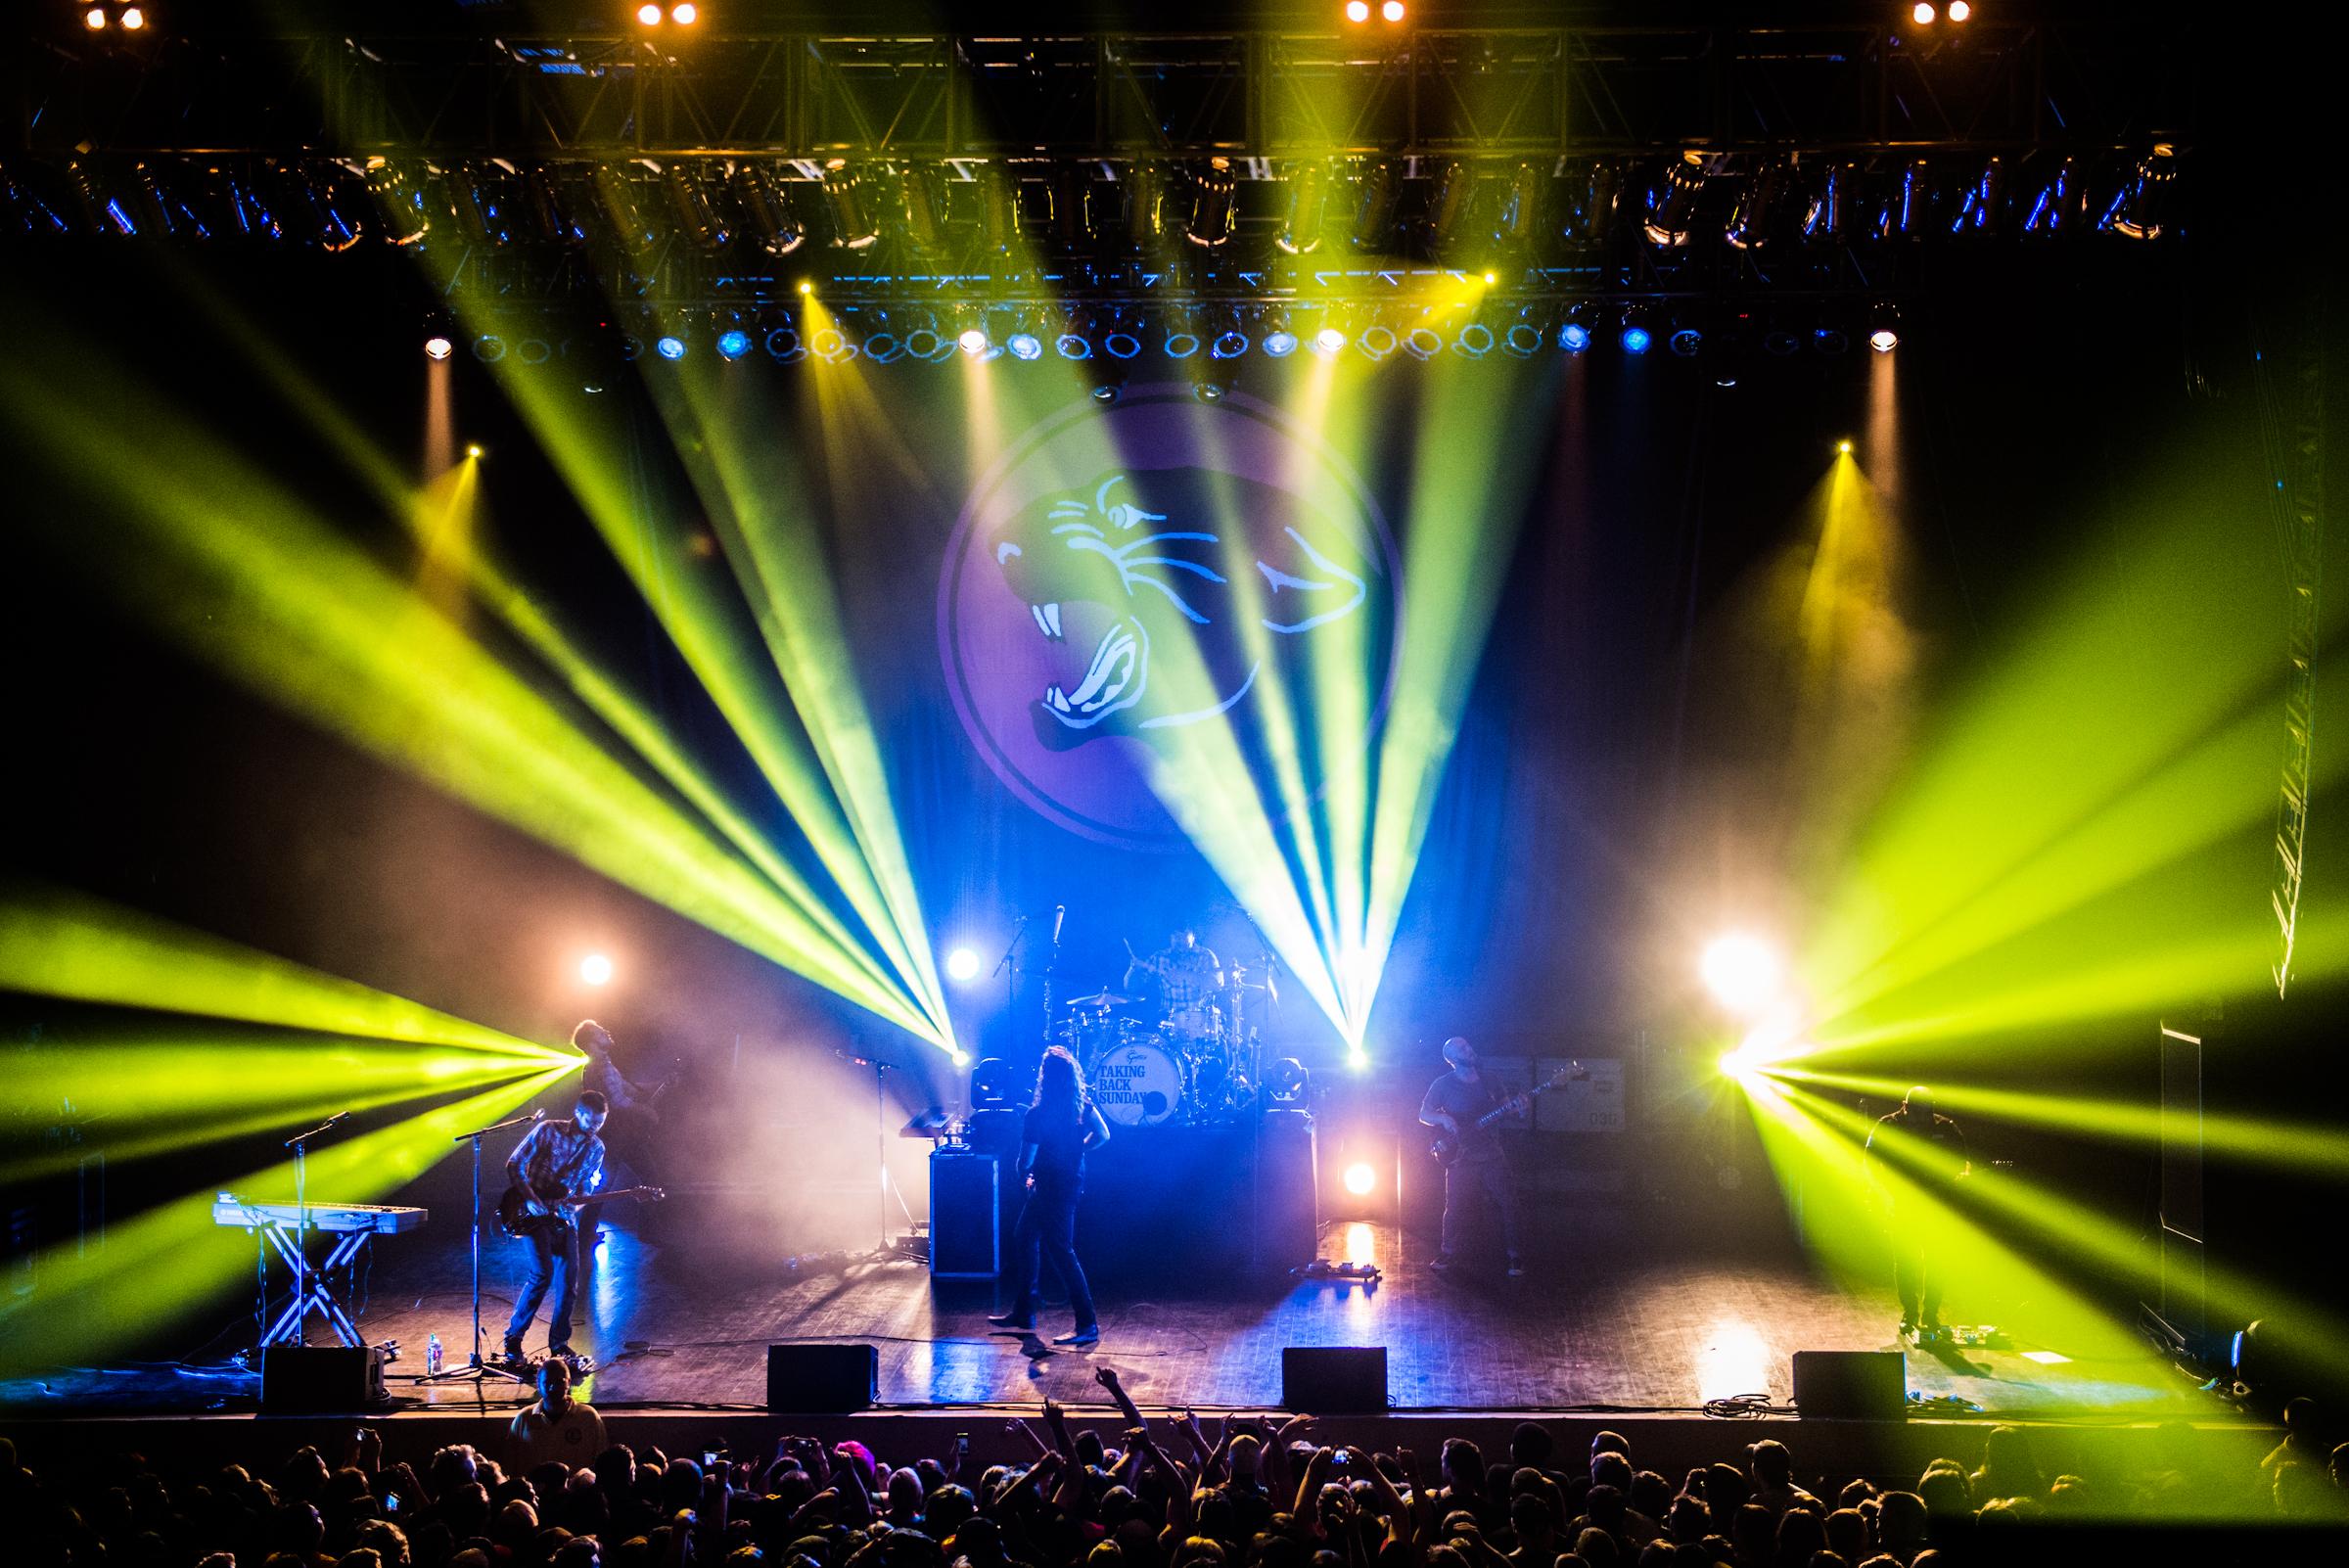 MEDIAte_TBS_TheUsed_Concert-2.jpg